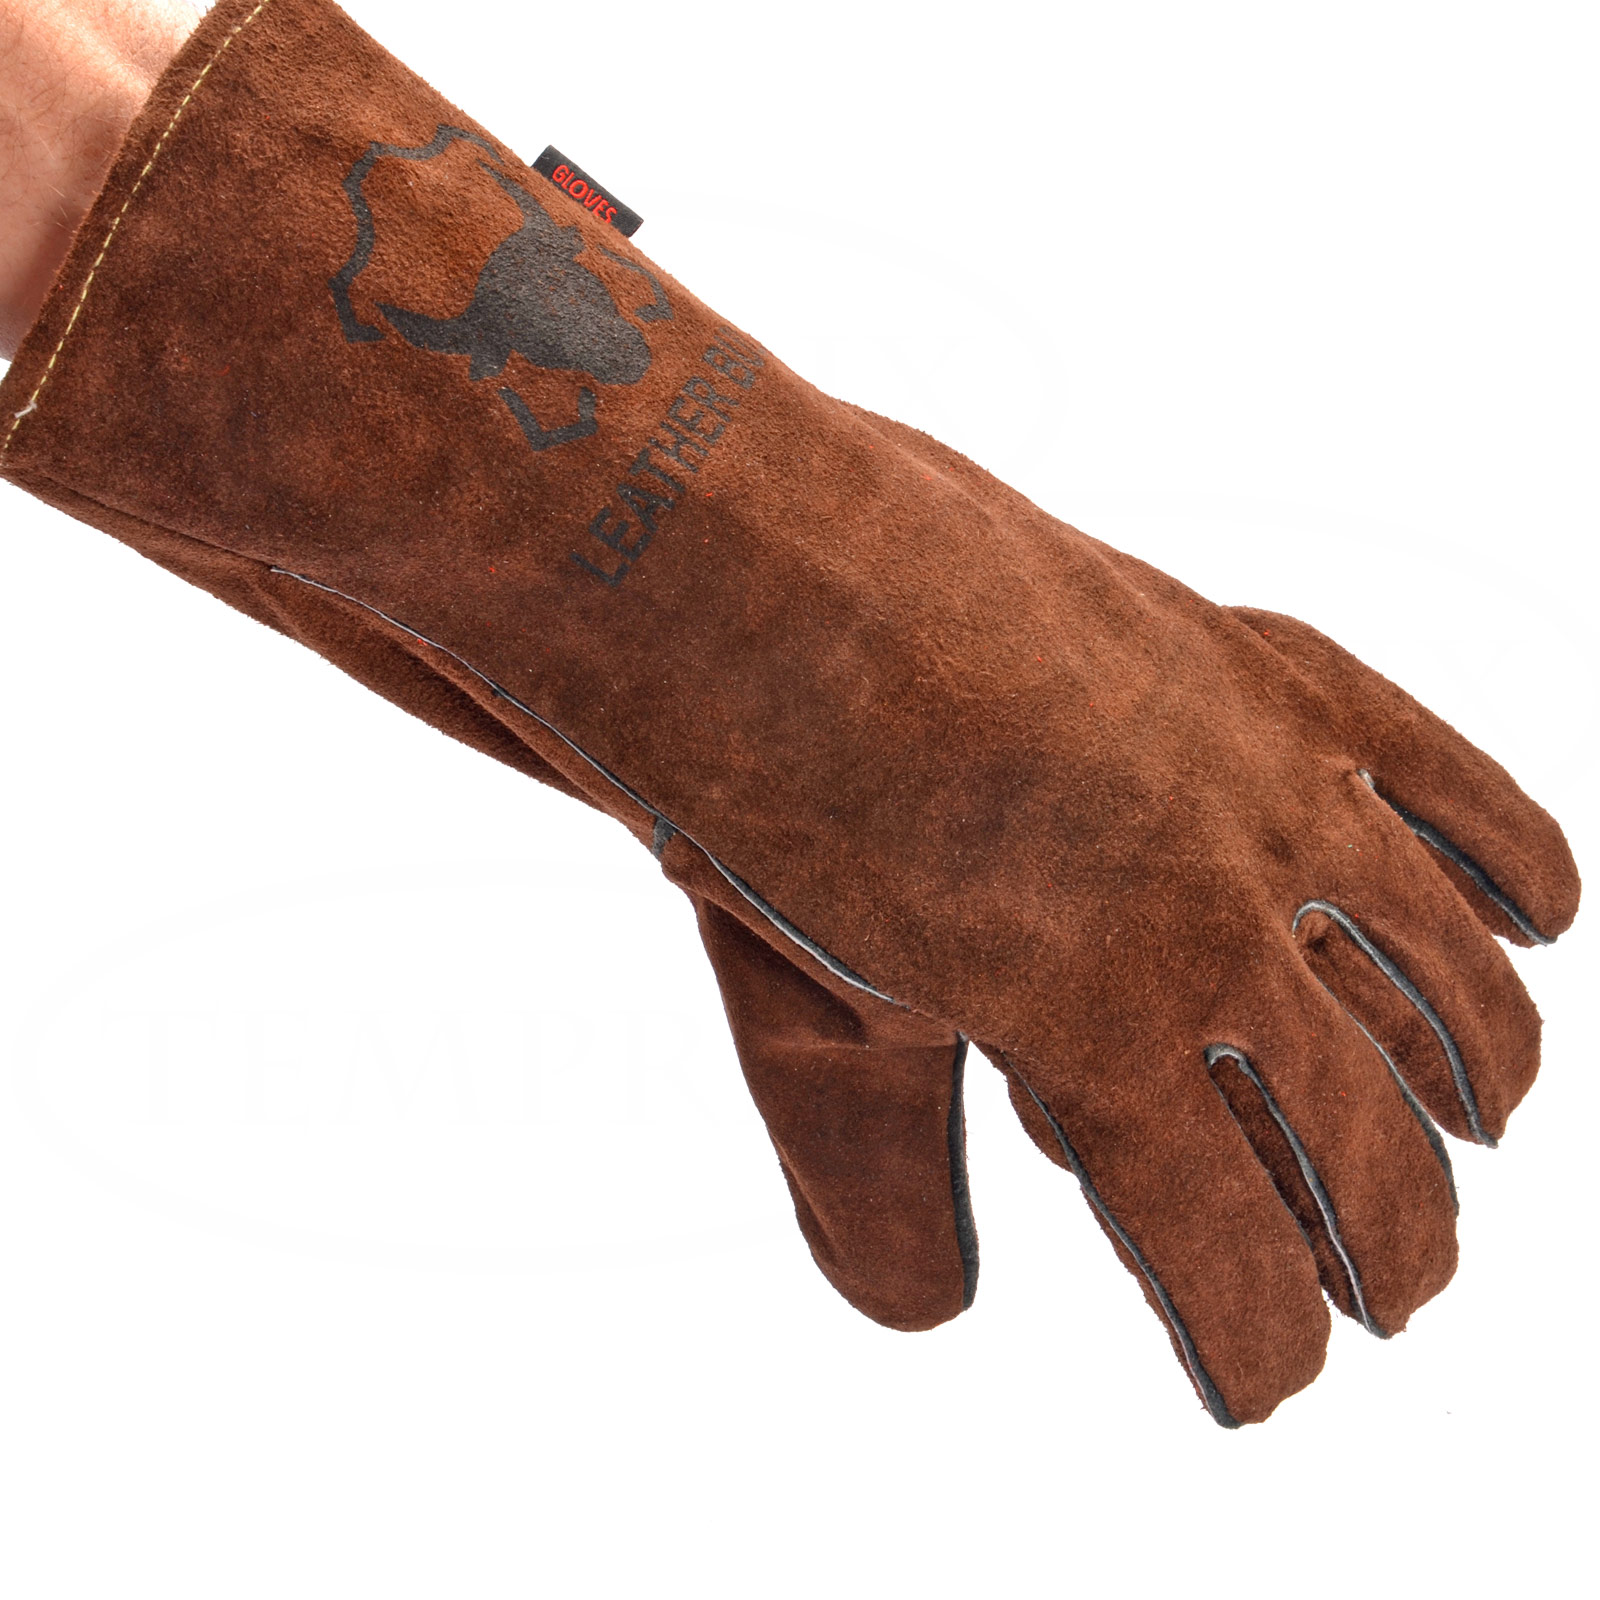 Grillhandschuh Leatherbull Braun